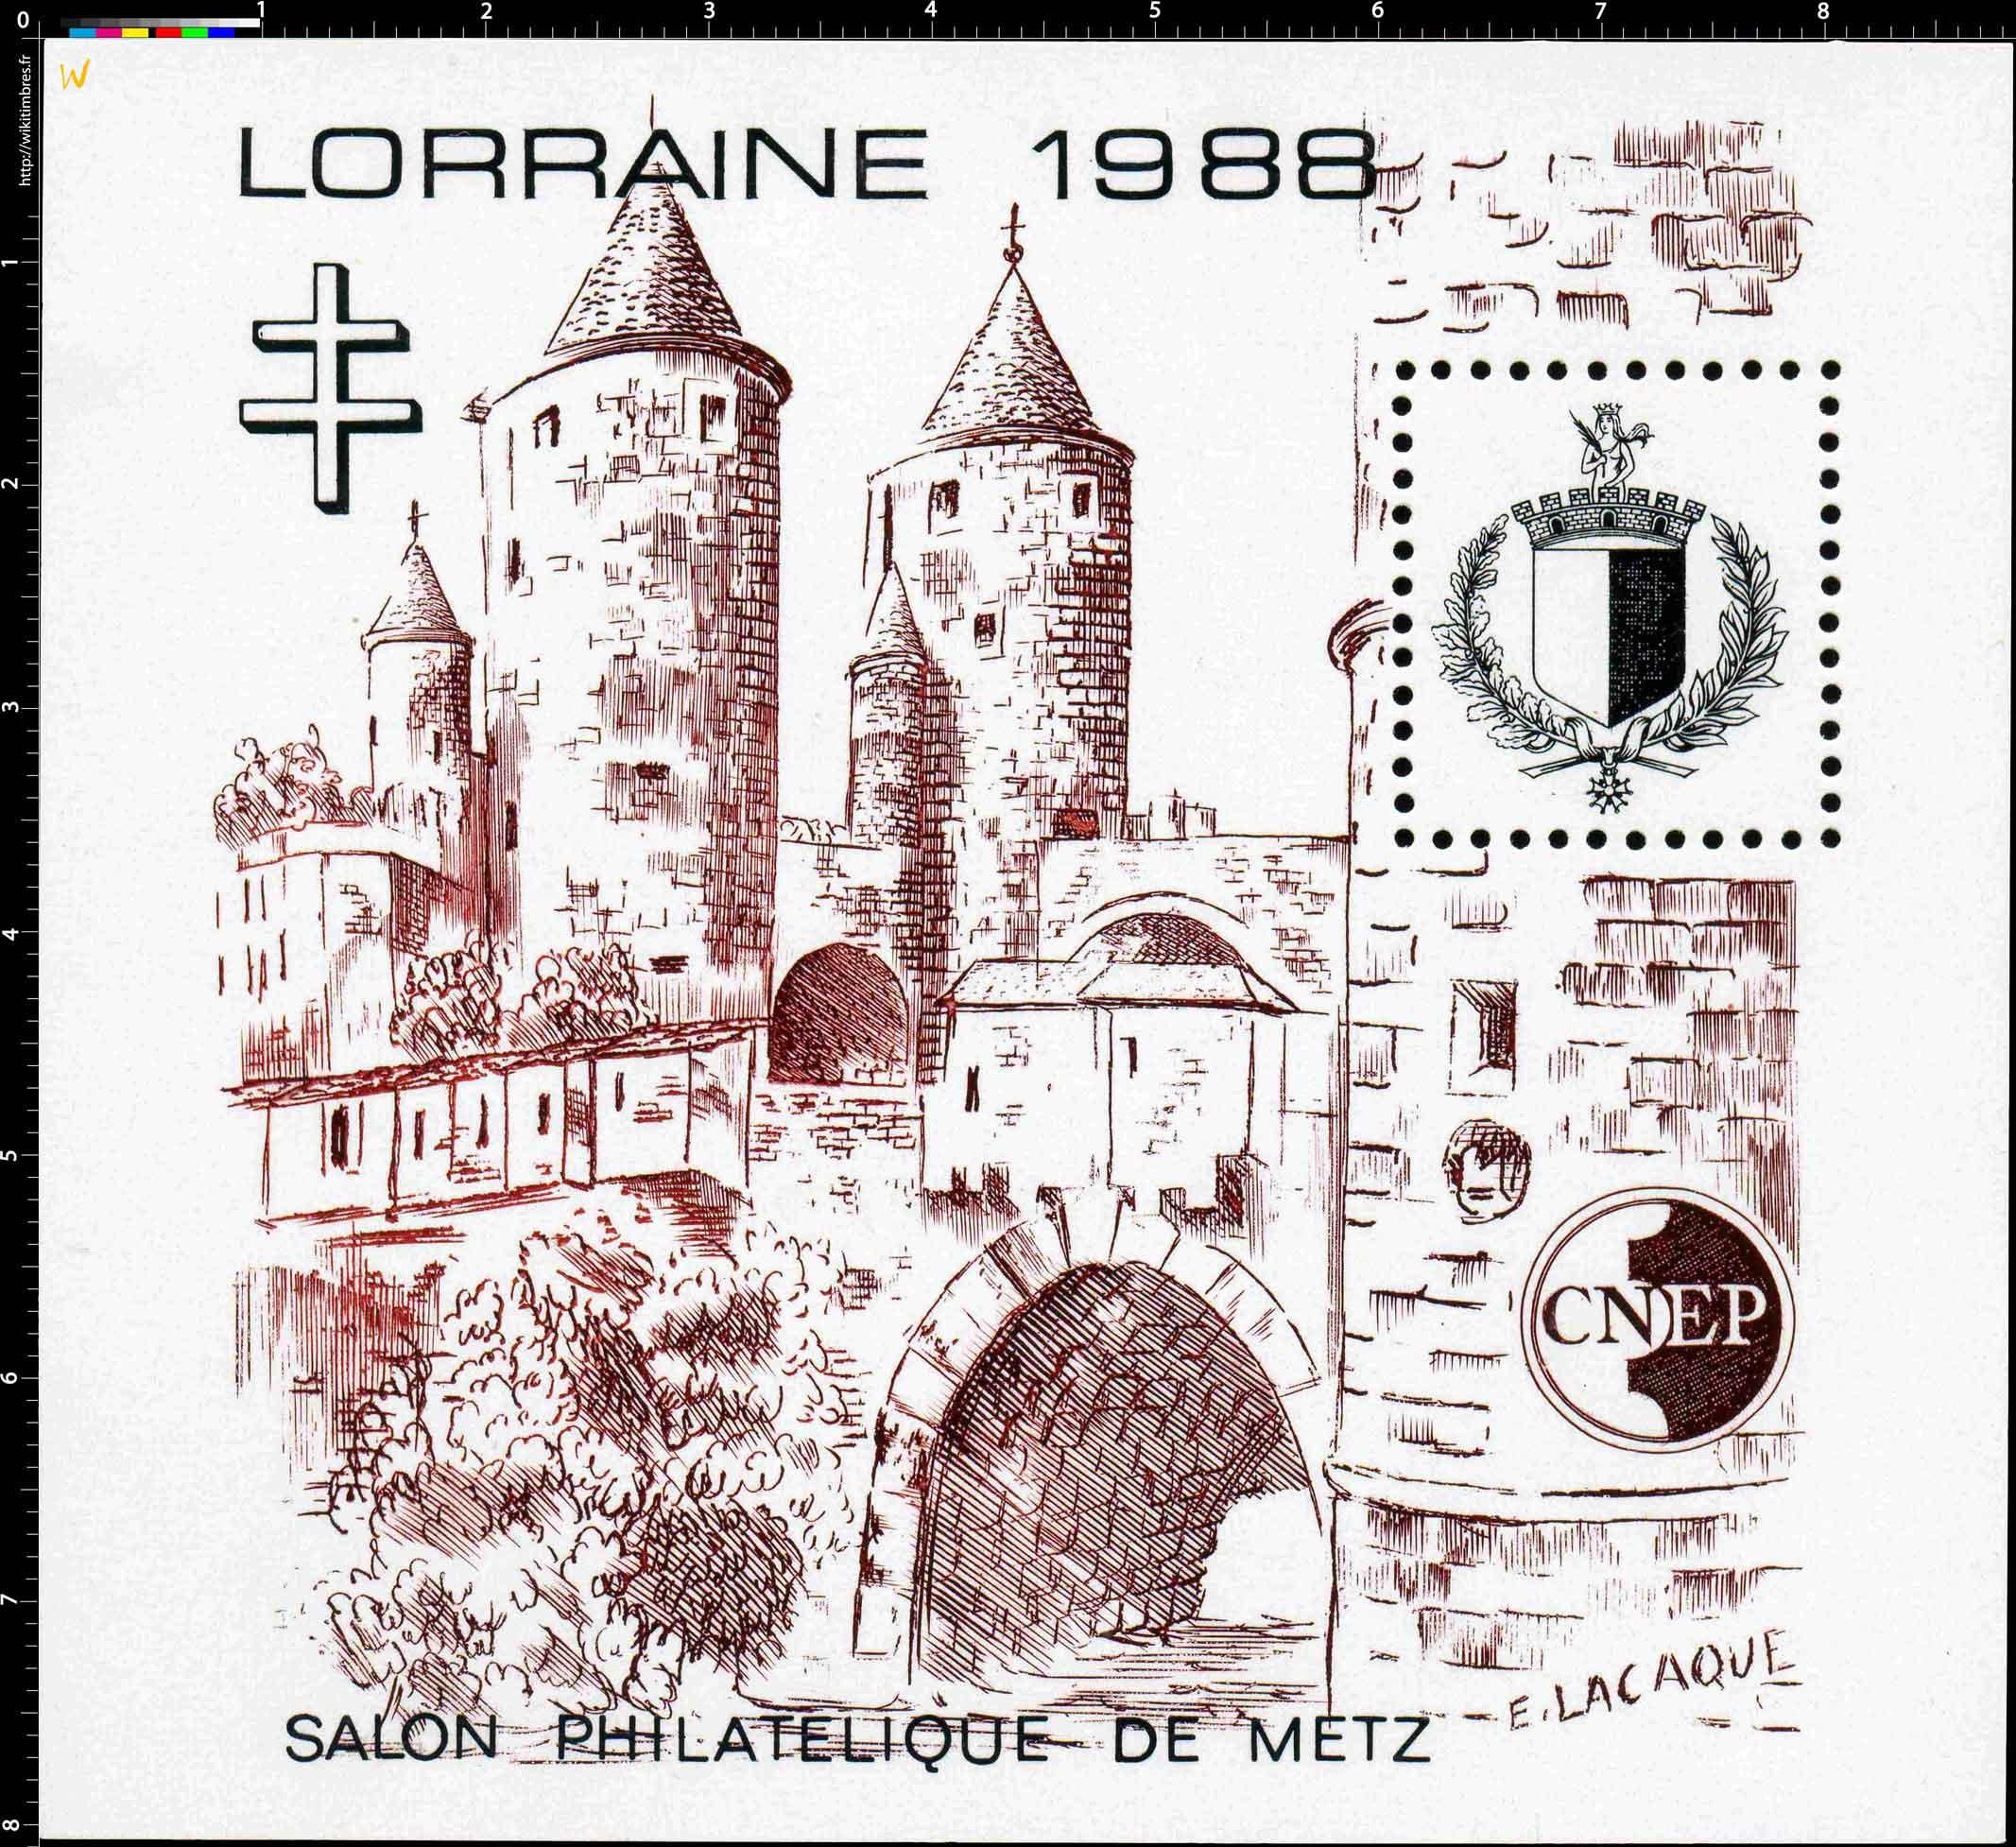 1988 Lorraine Salon philatélique de Metz CNEP